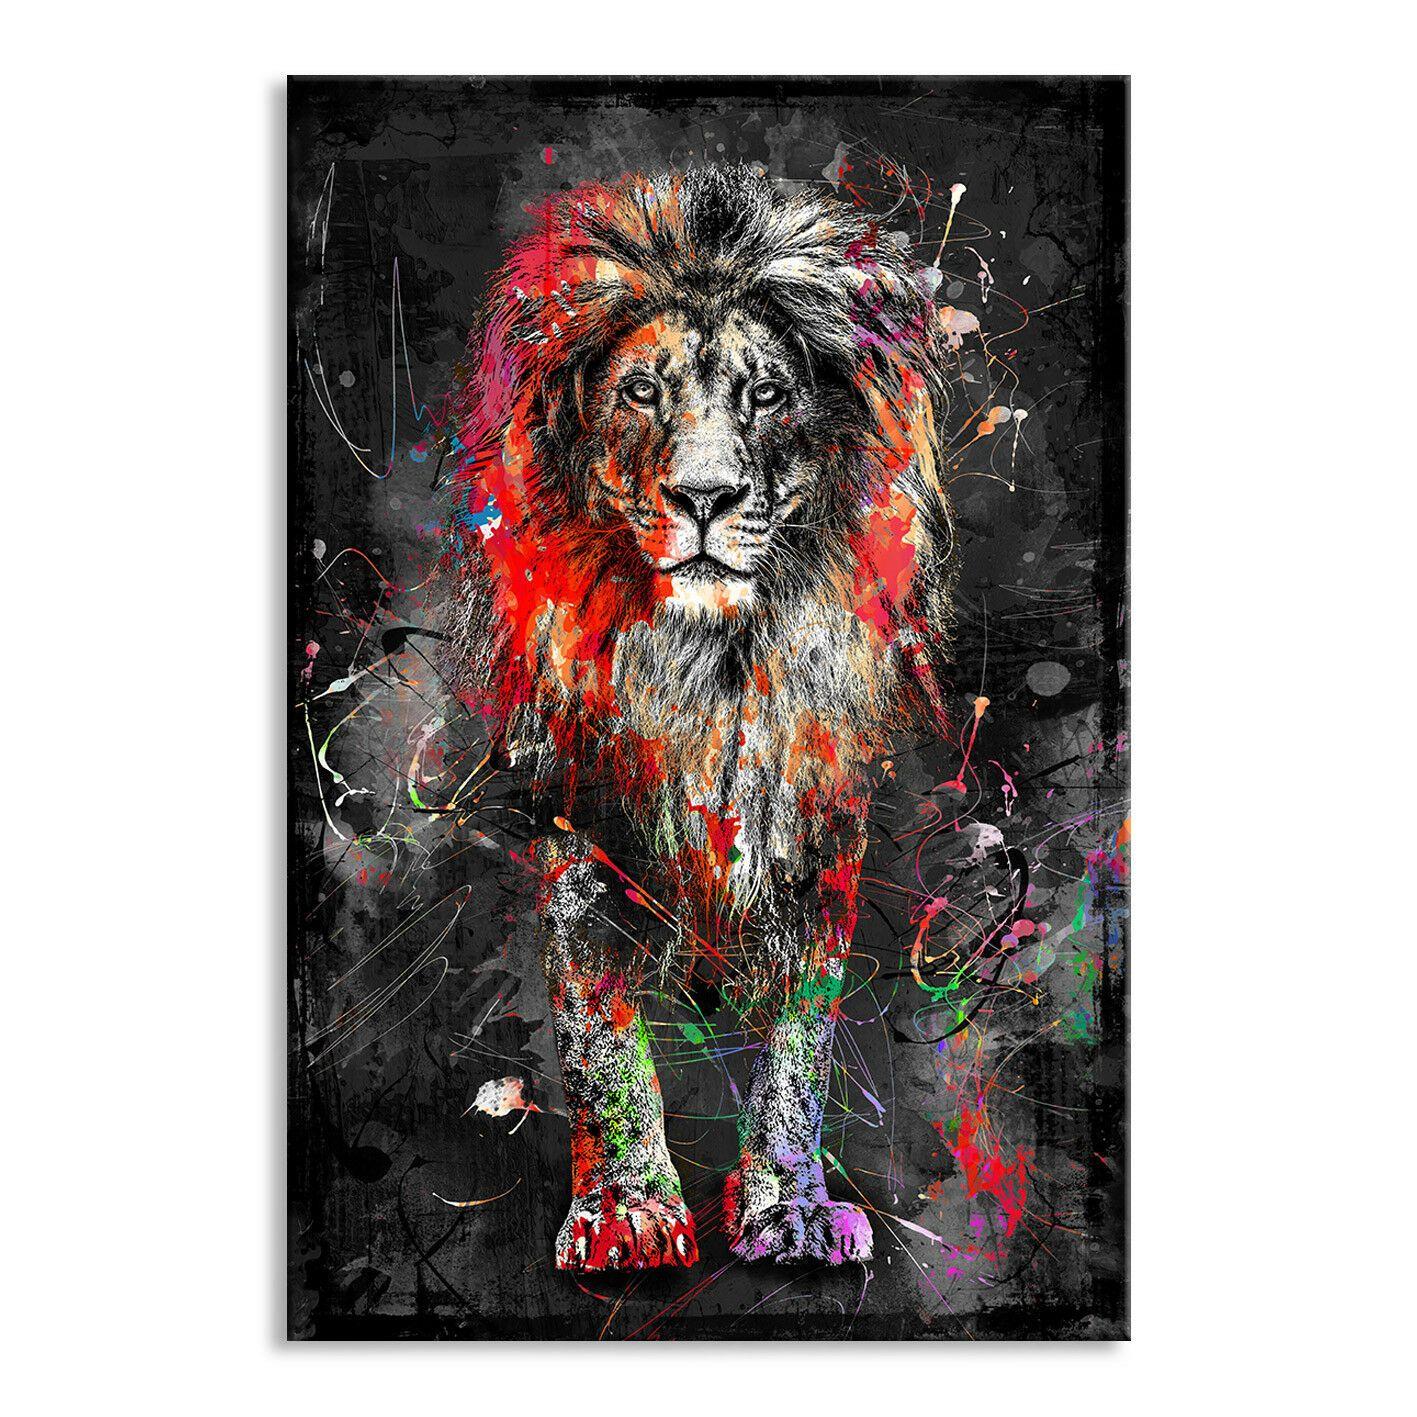 Leinwand Bild Xxl Abstrakt LÖwe Lion Natur Deko Wandbilder Kunstdruck Canvas Ebay Wandbild Löwe Leinwand Malerei Ideen Leinwand